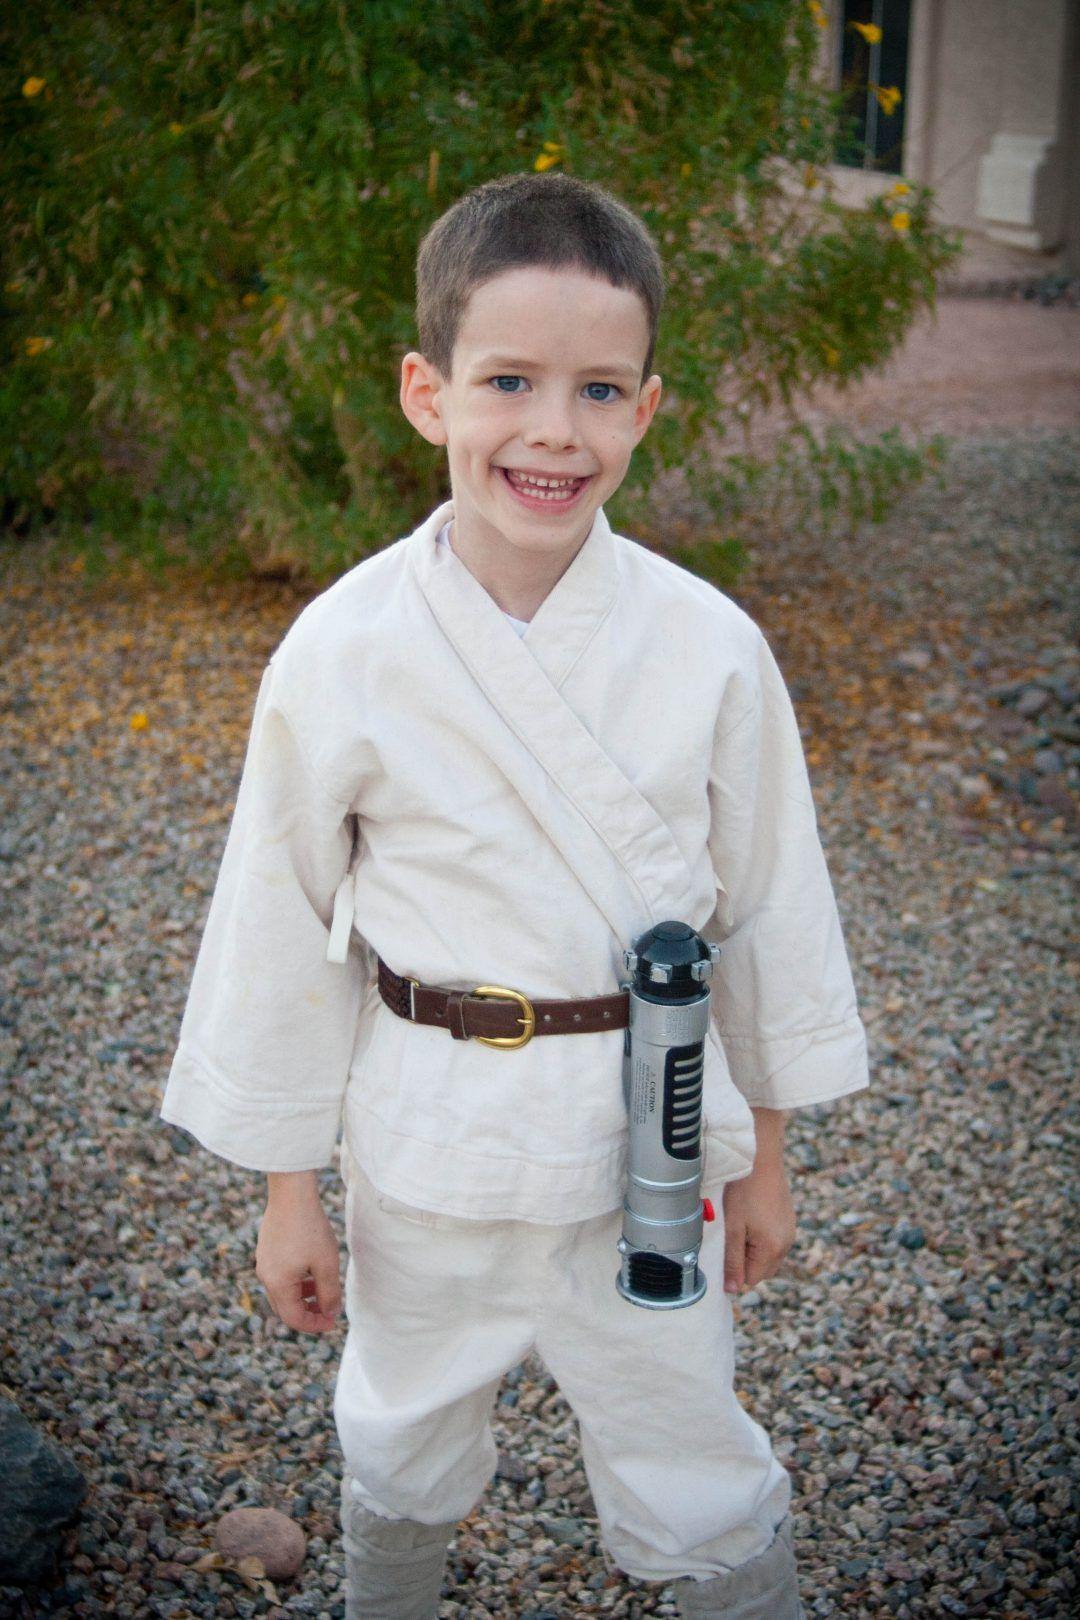 DIY Luke Skywalker Star Wars Costume | Your Costume Idea for ...